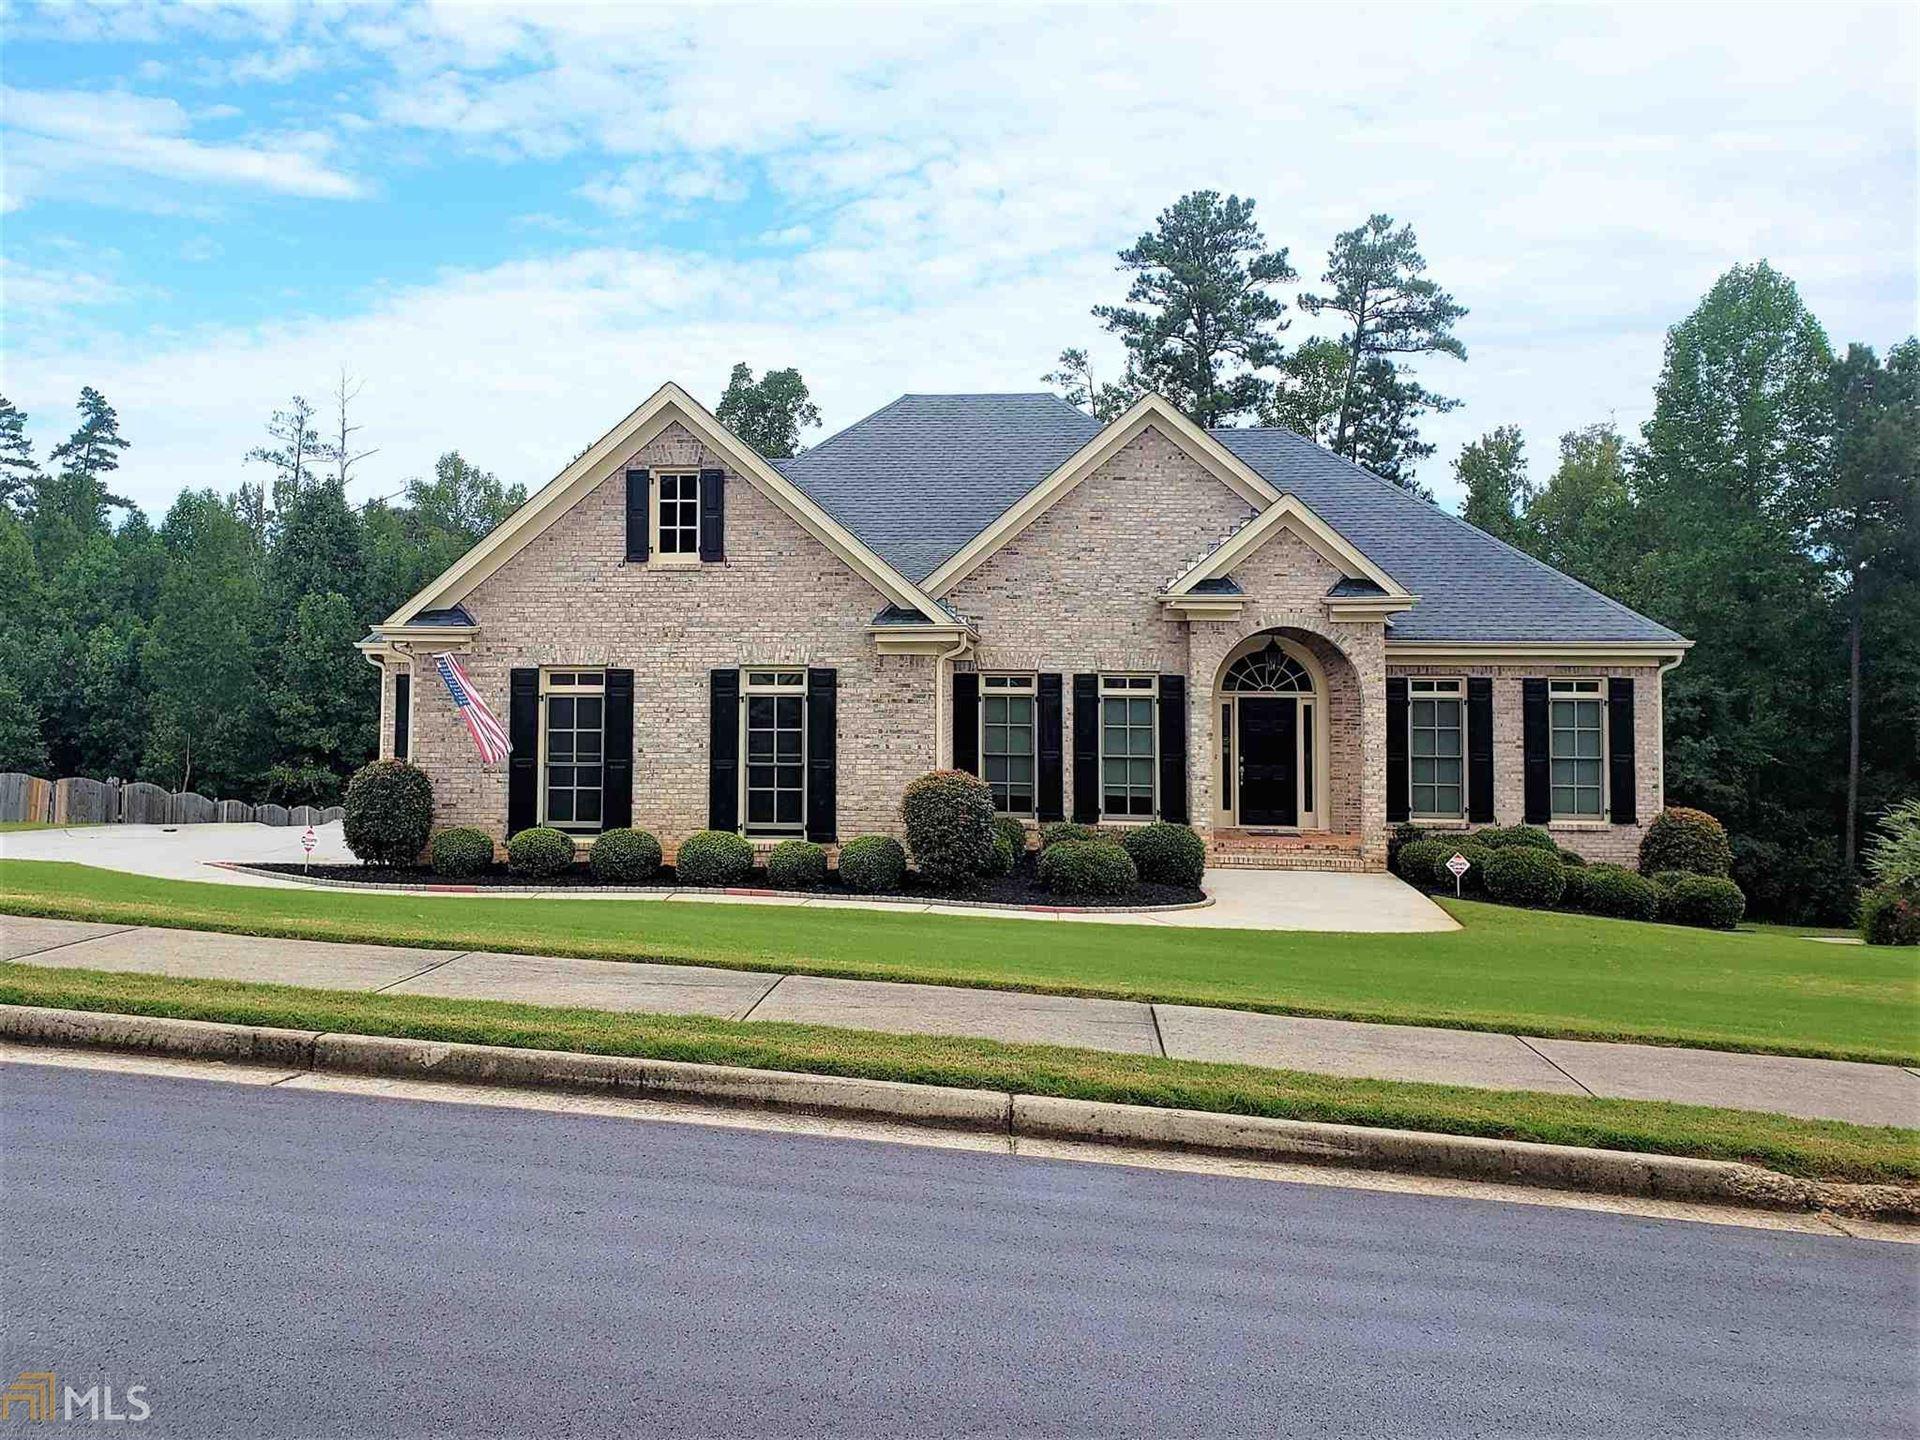 Photo of 8714 Camron Drive, Winston, GA 30187 (MLS # 8862168)